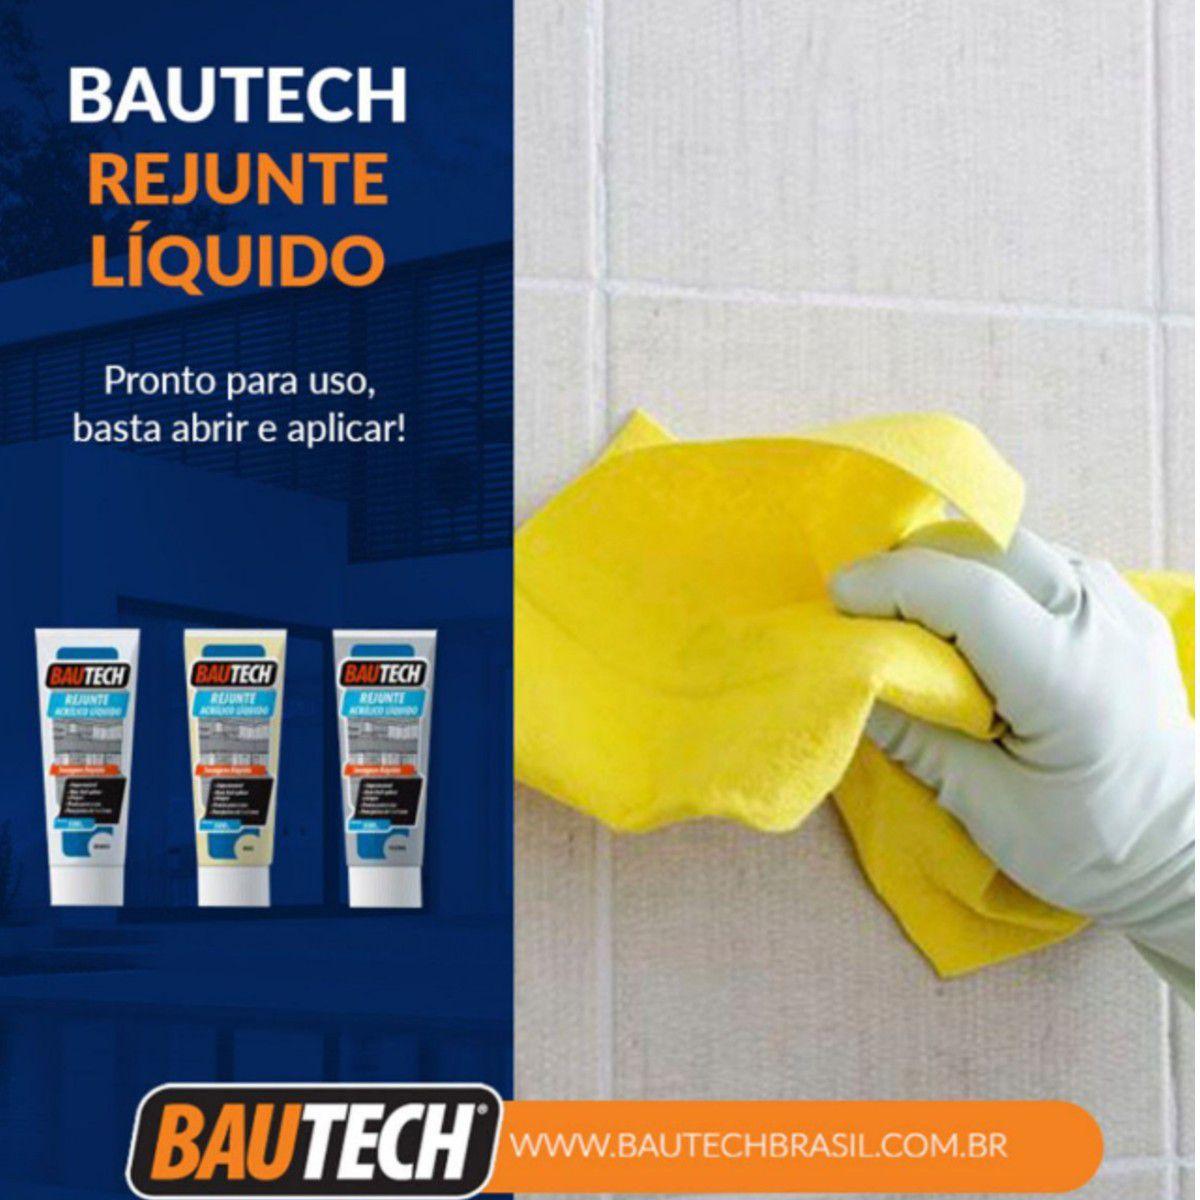 Rejunte Acrílico Liquido Bautech Marrom 470g